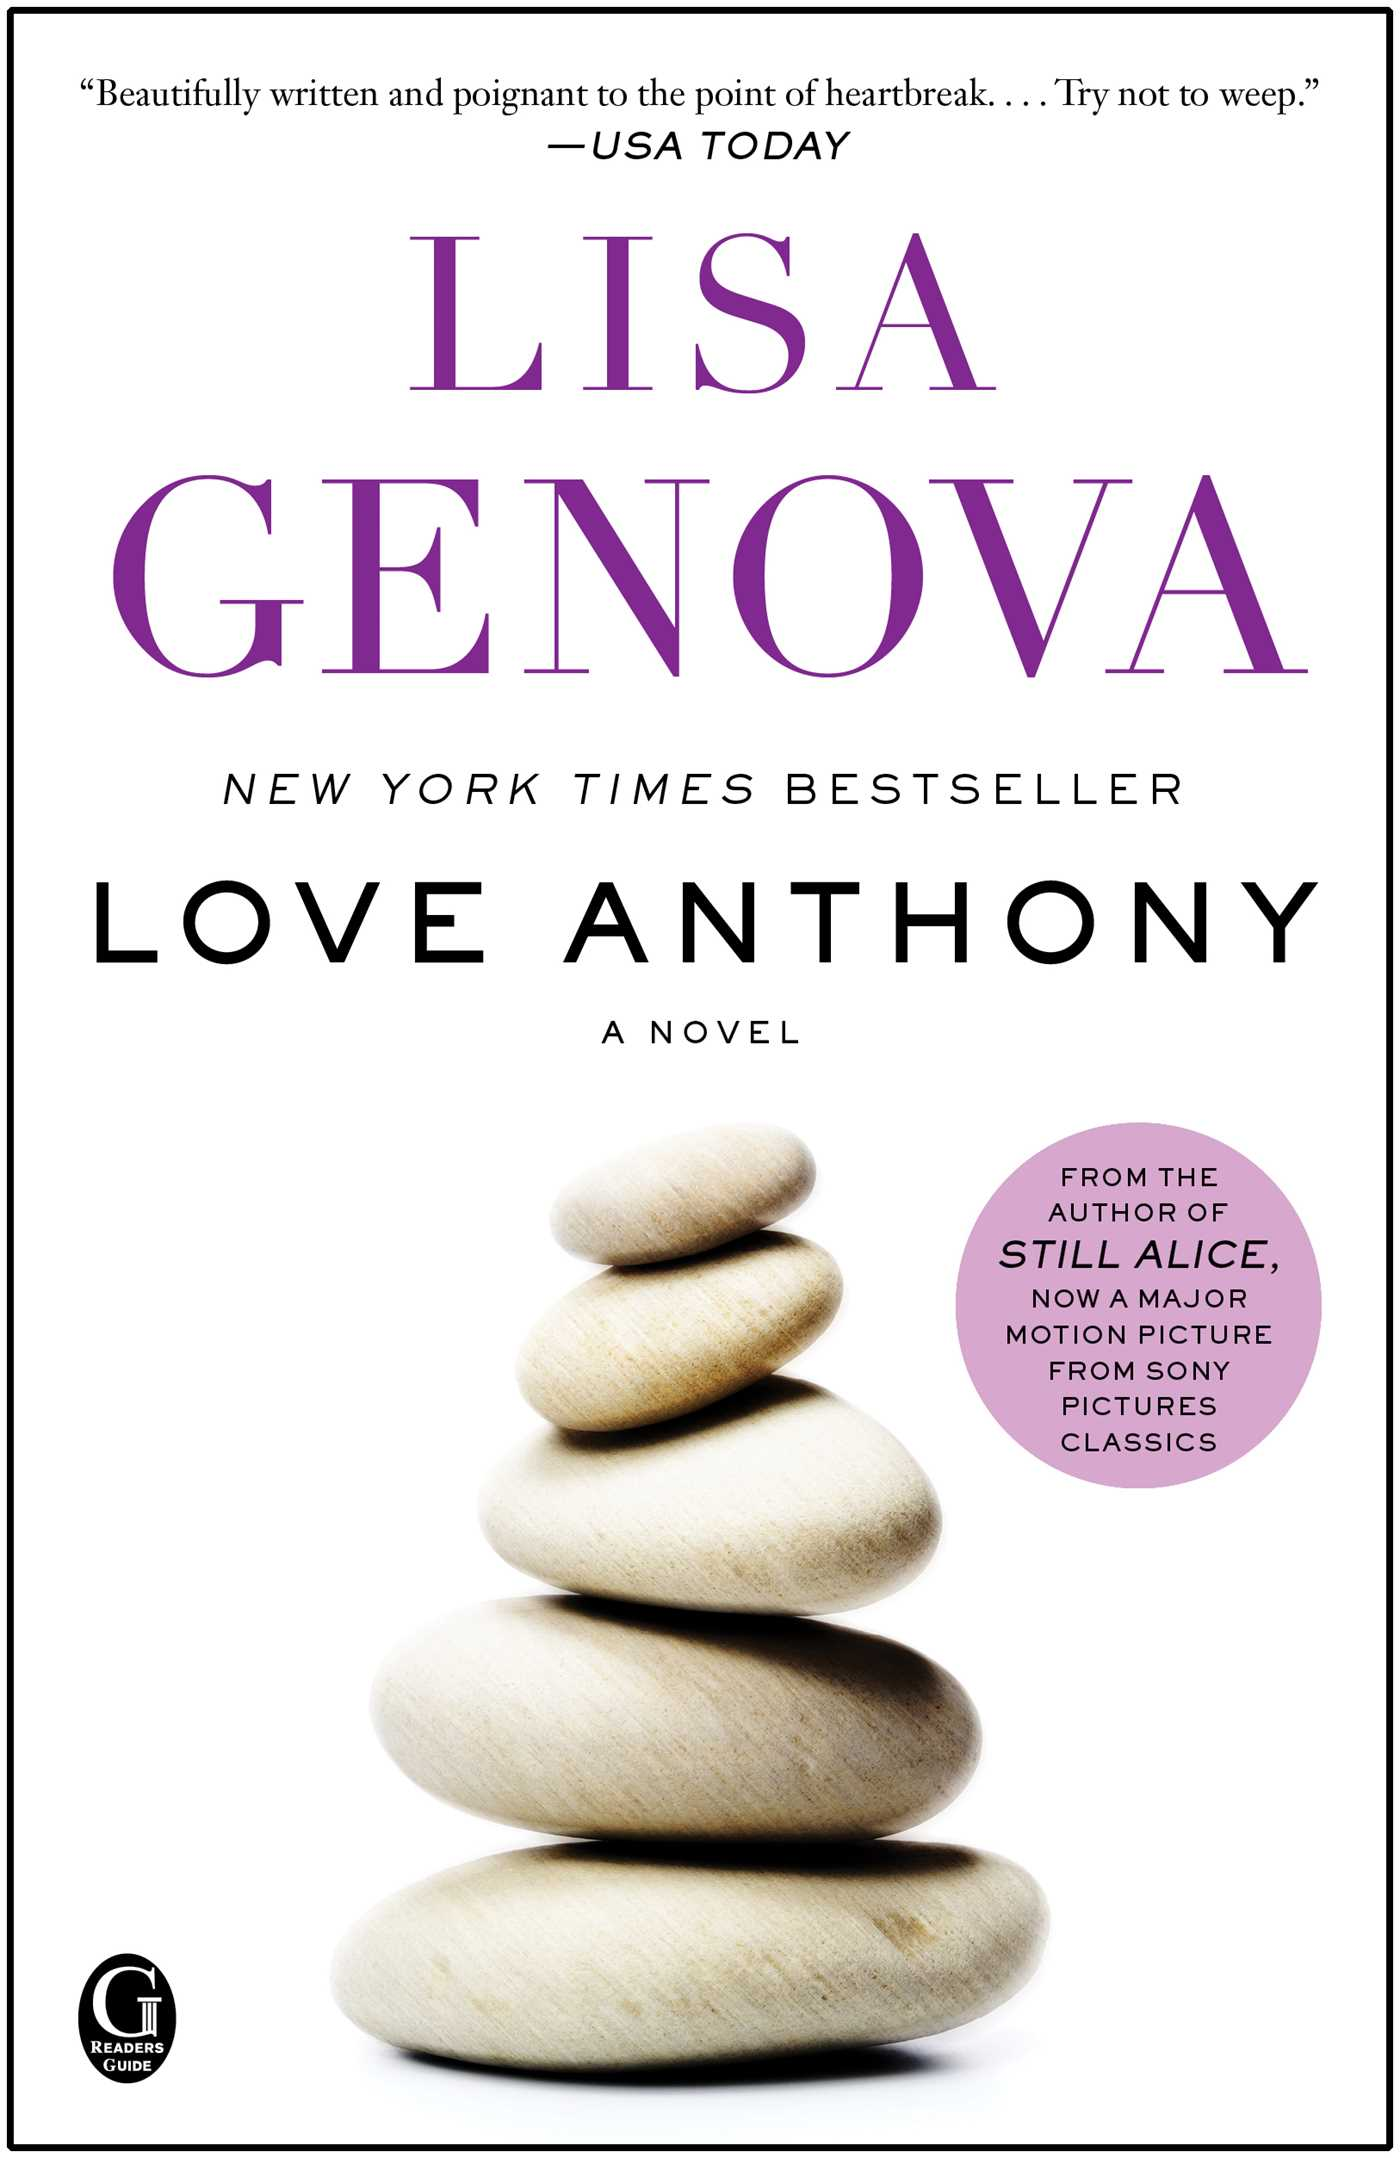 Love anthony 9781439164693 hr